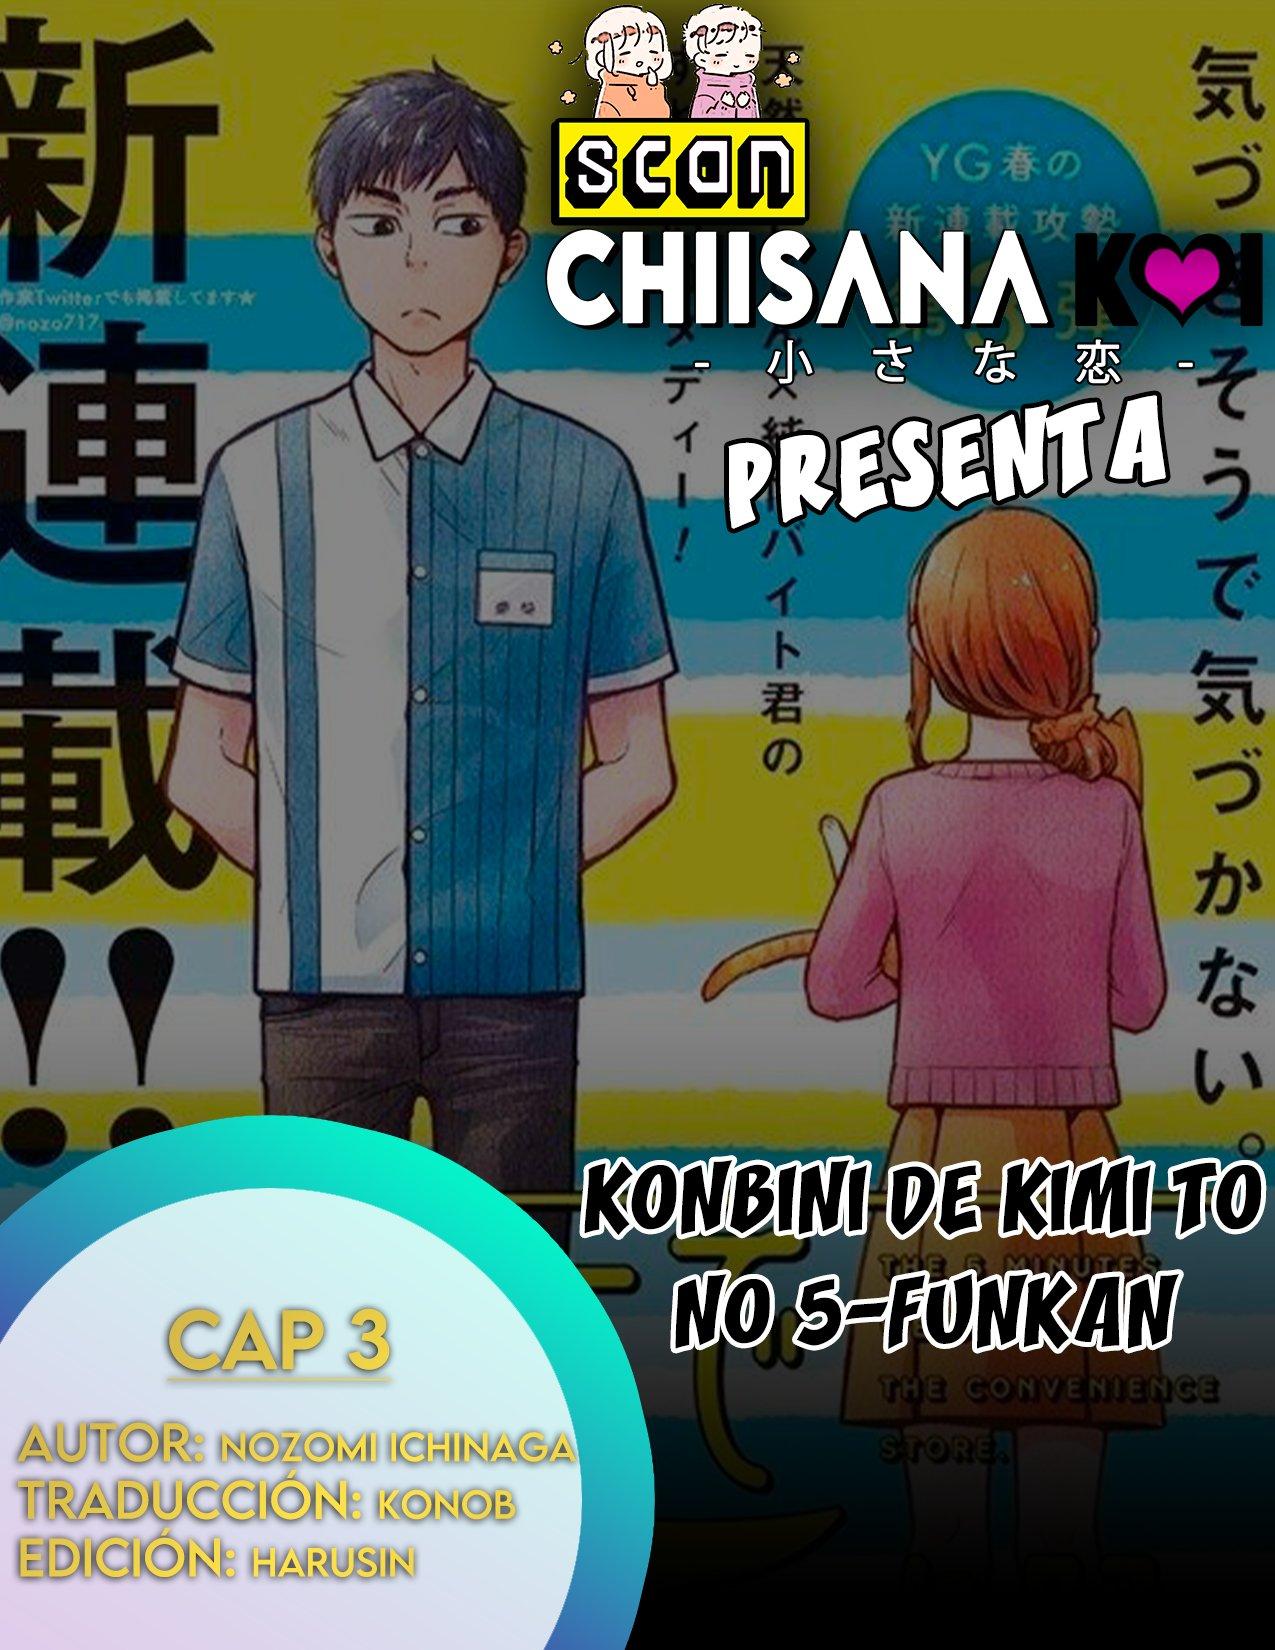 https://nine.mangadogs.com/es_manga/pic9/0/37696/971846/9af1dfc986d15ab8a469941e77d6fbc0.jpg Page 1